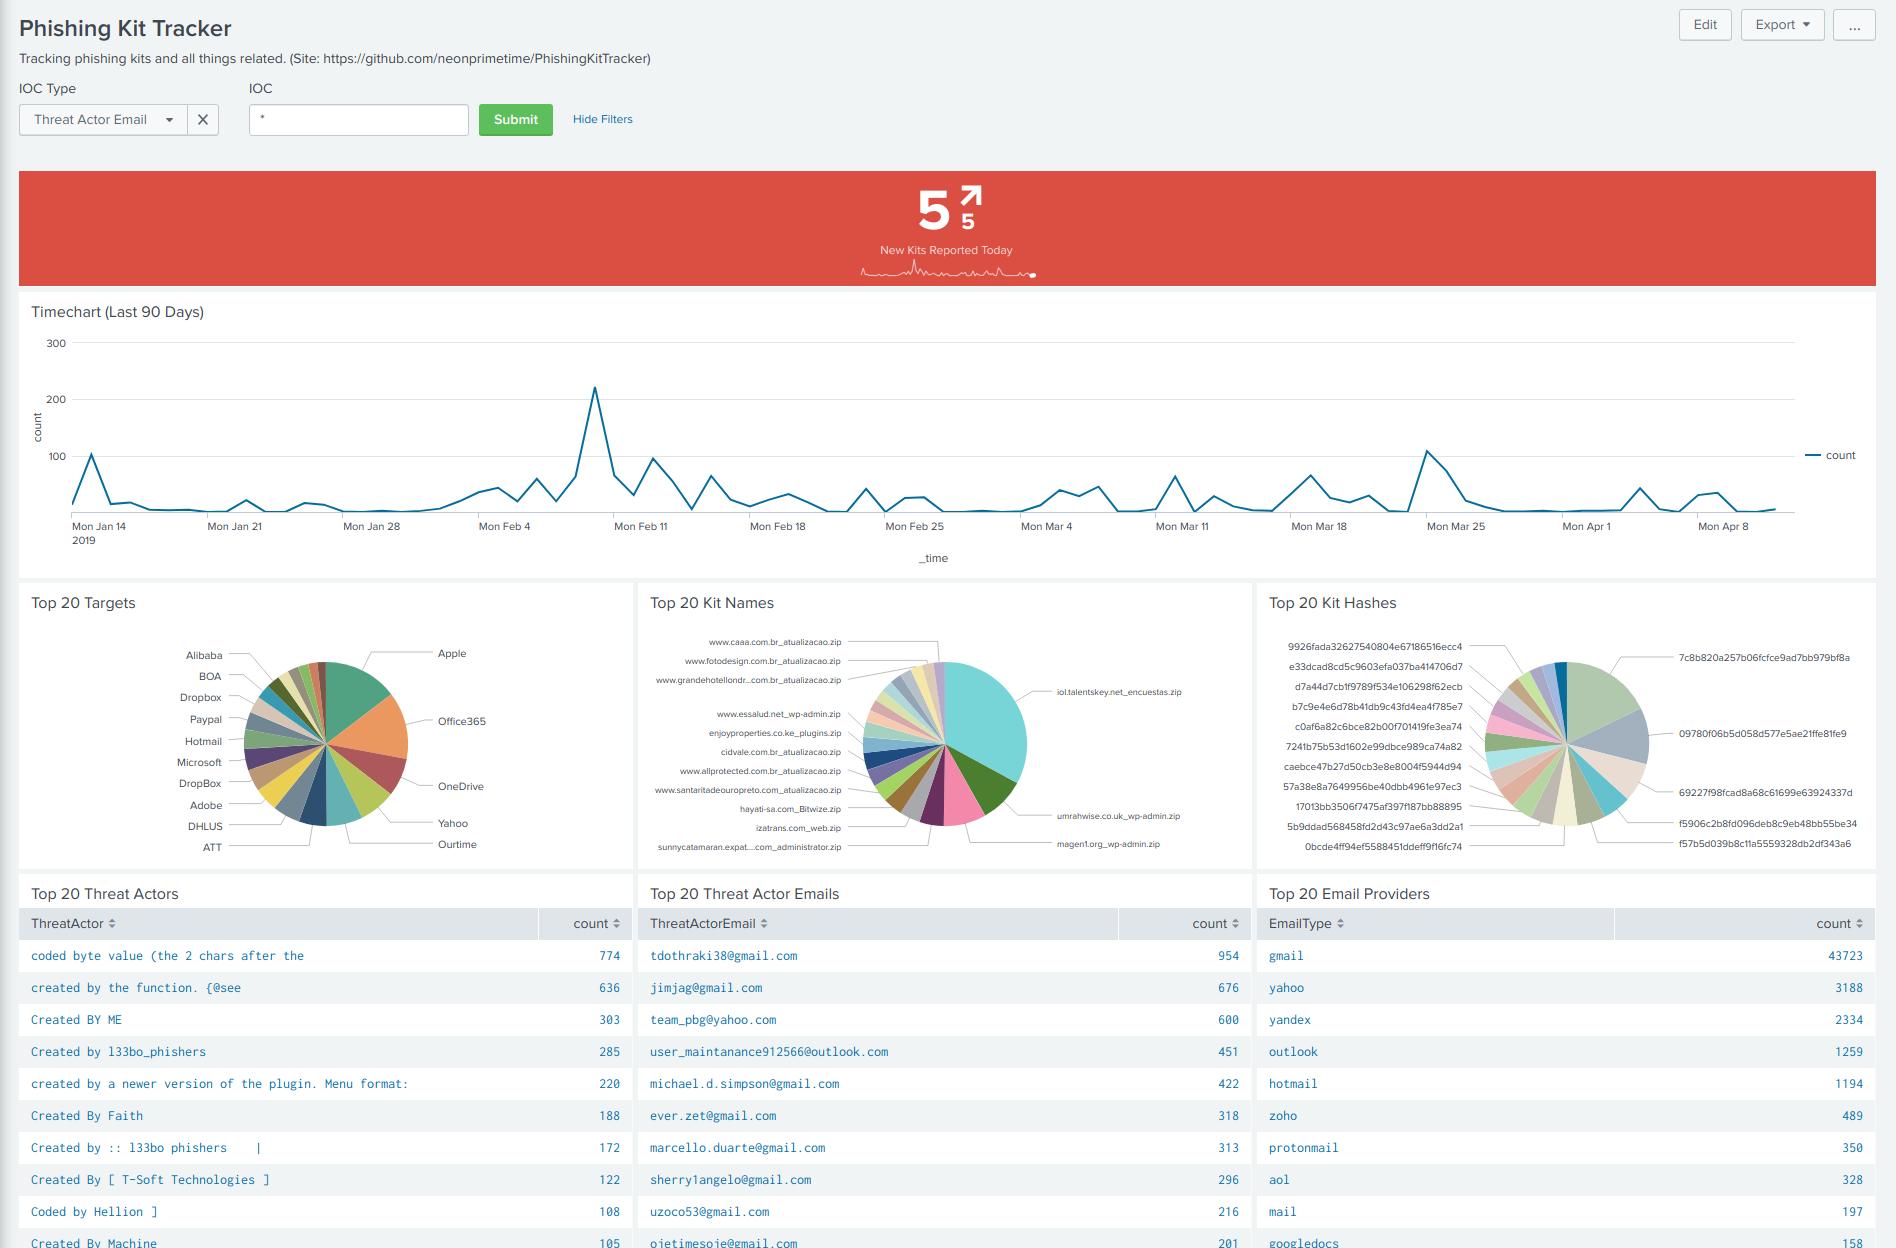 Phishing Kit Tracker - Dashboard